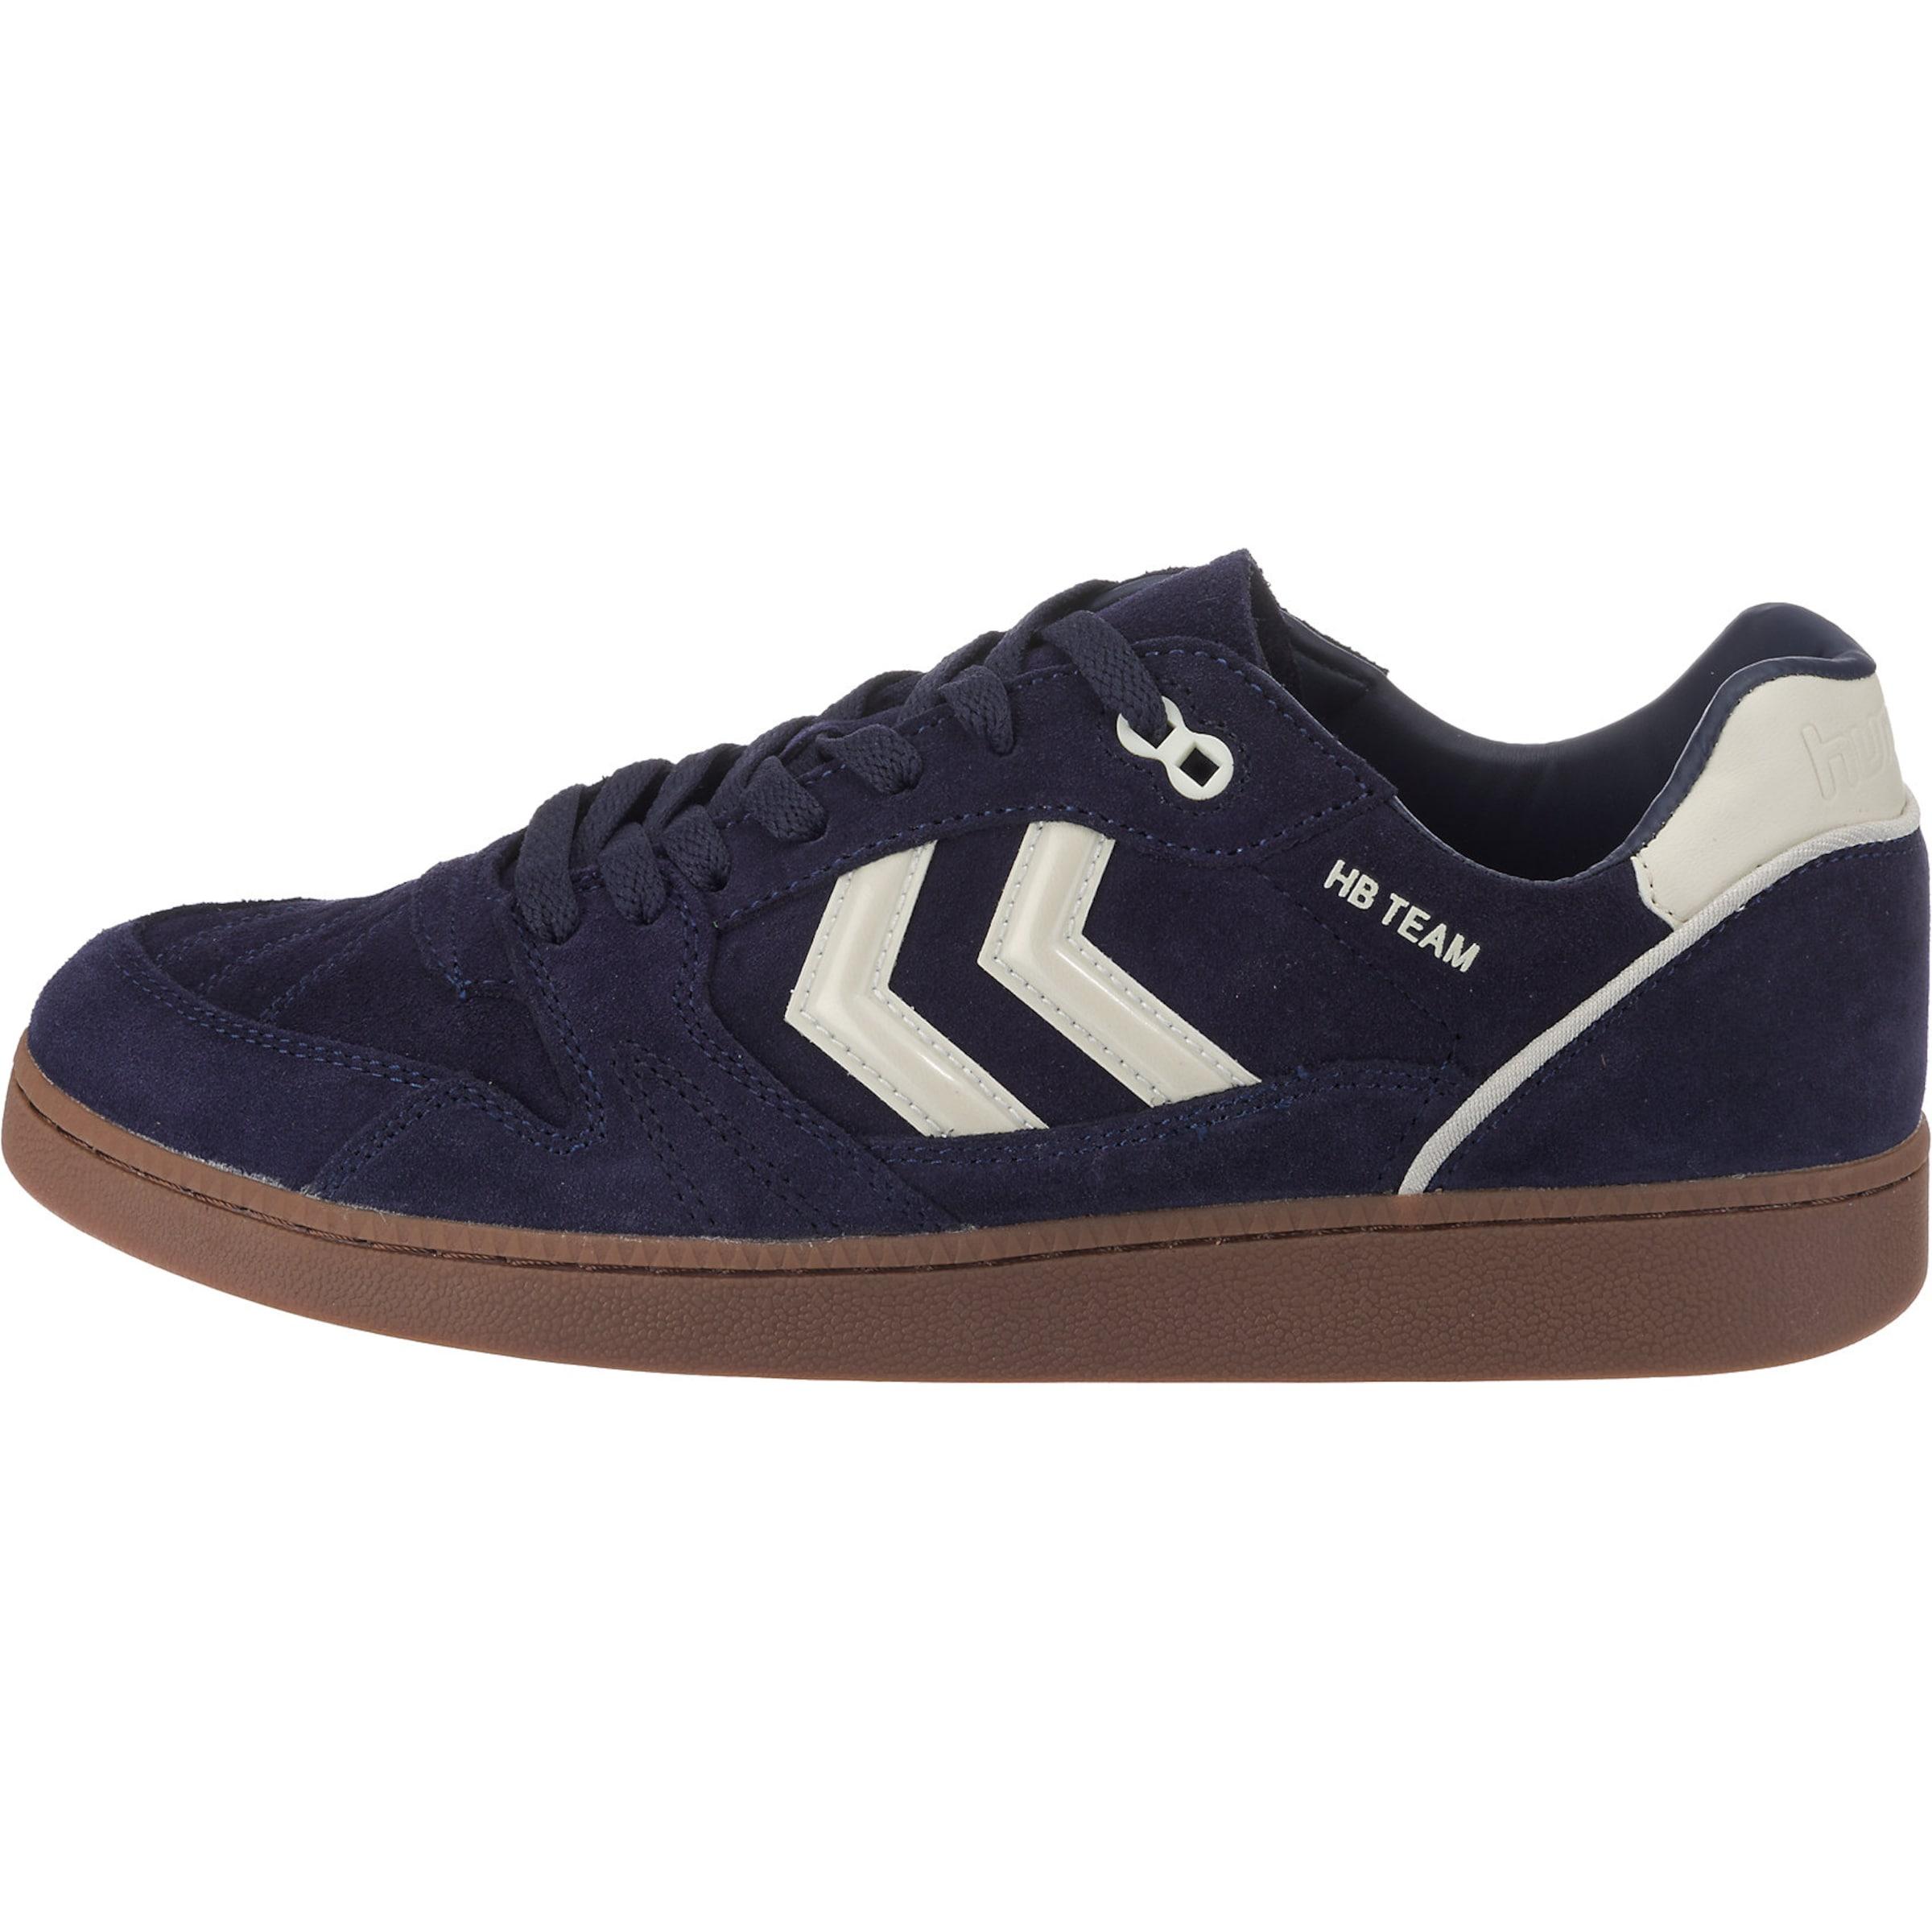 BlauWeiß 'hb Team' Hummel Sneakers Low In Fl1Jc3TK